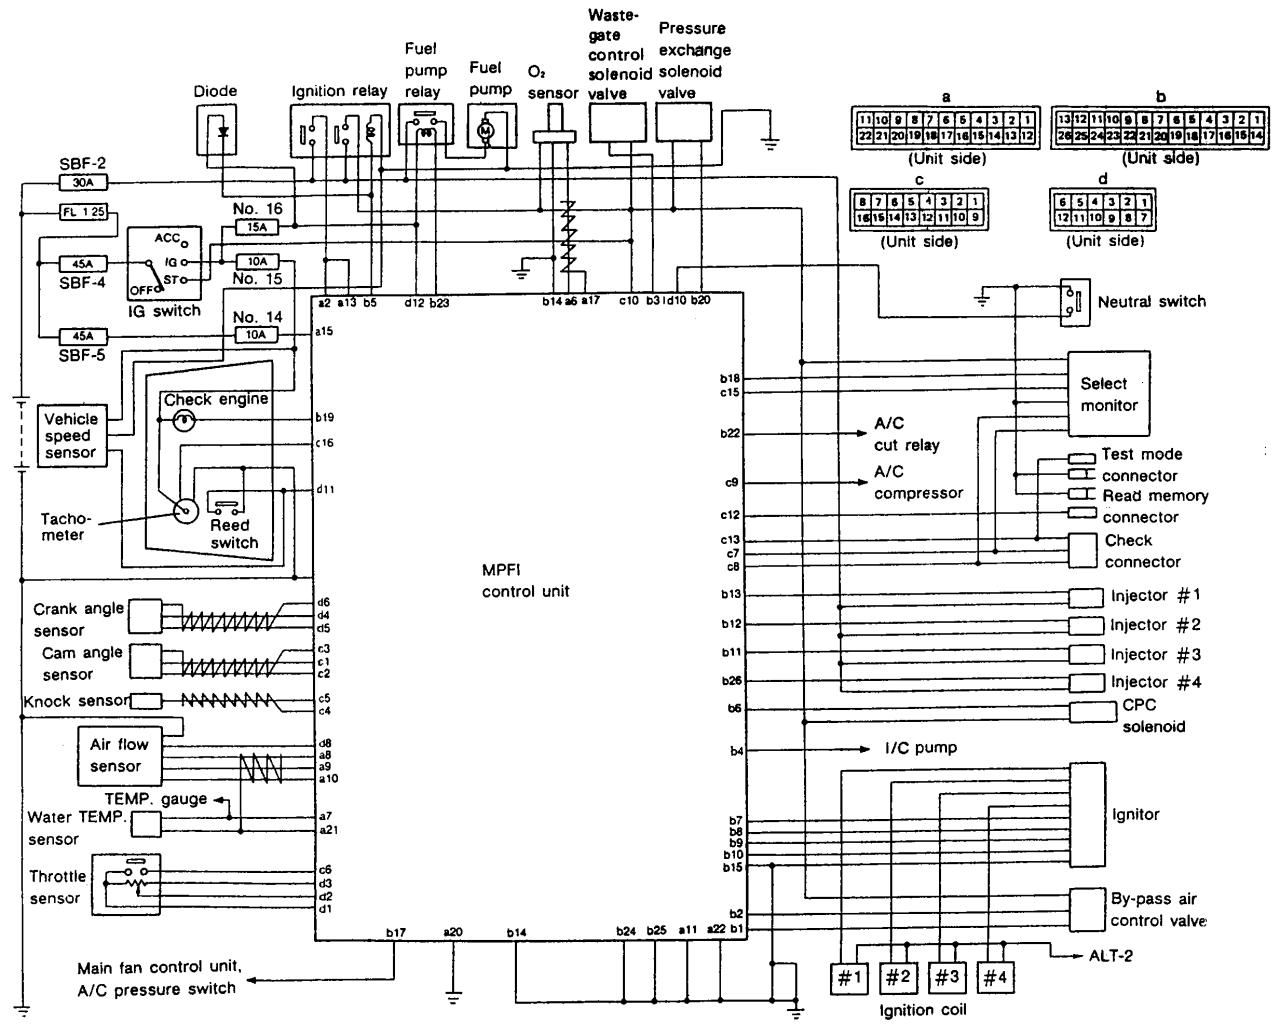 2002 subaru forester wiring diagram wiring diagram subaru e3 wiring diagram  wiring diagram subaru e3 wiring diagram